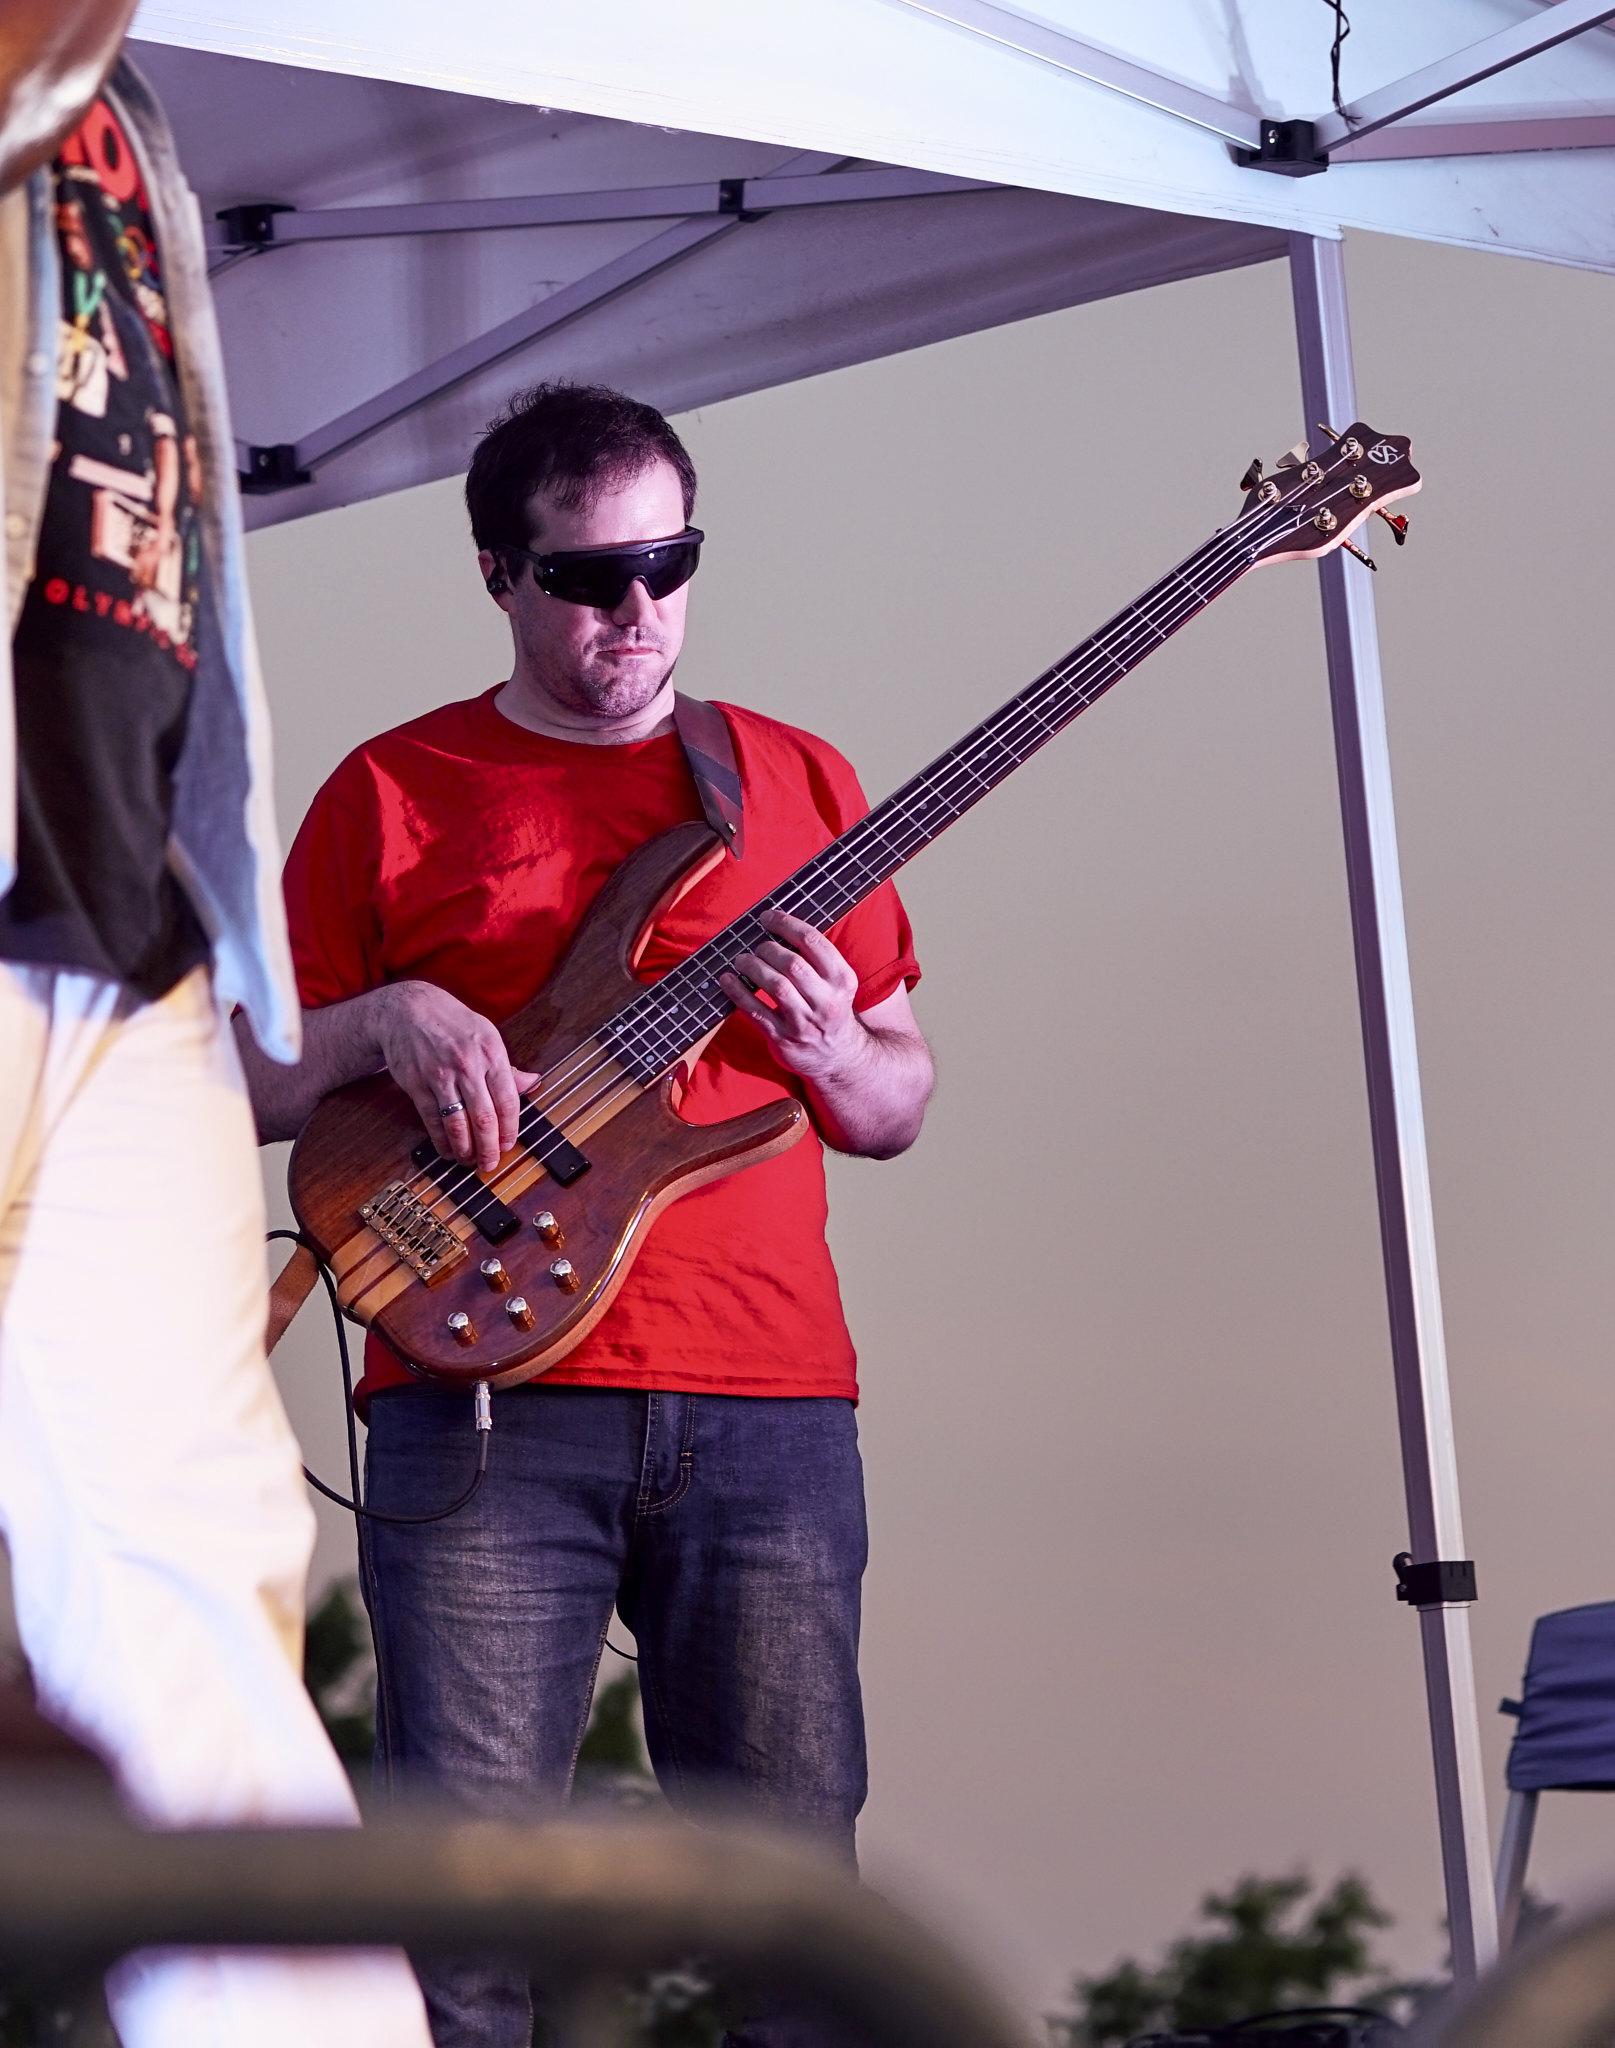 Guitar Guy Shredding